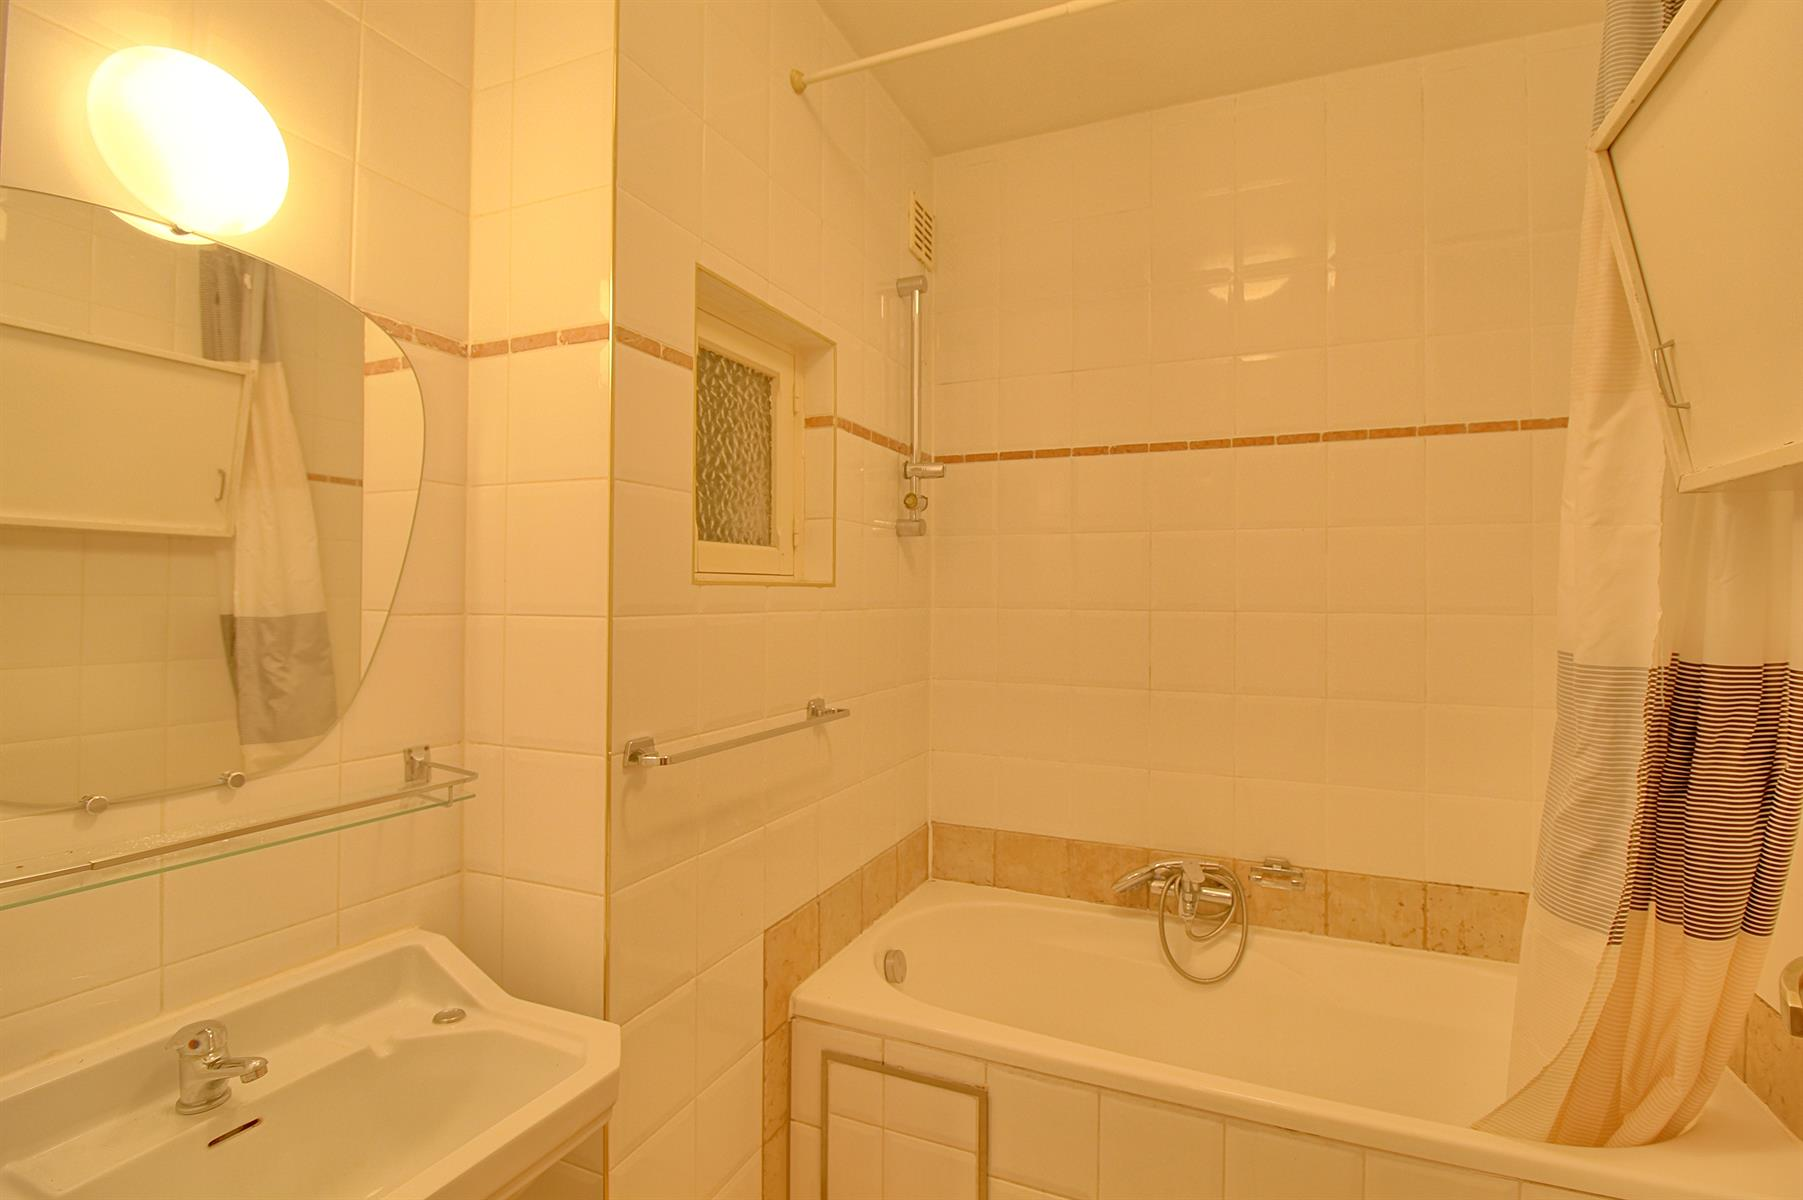 Appartement - Woluwe-Saint-Lambert - #4169126-5